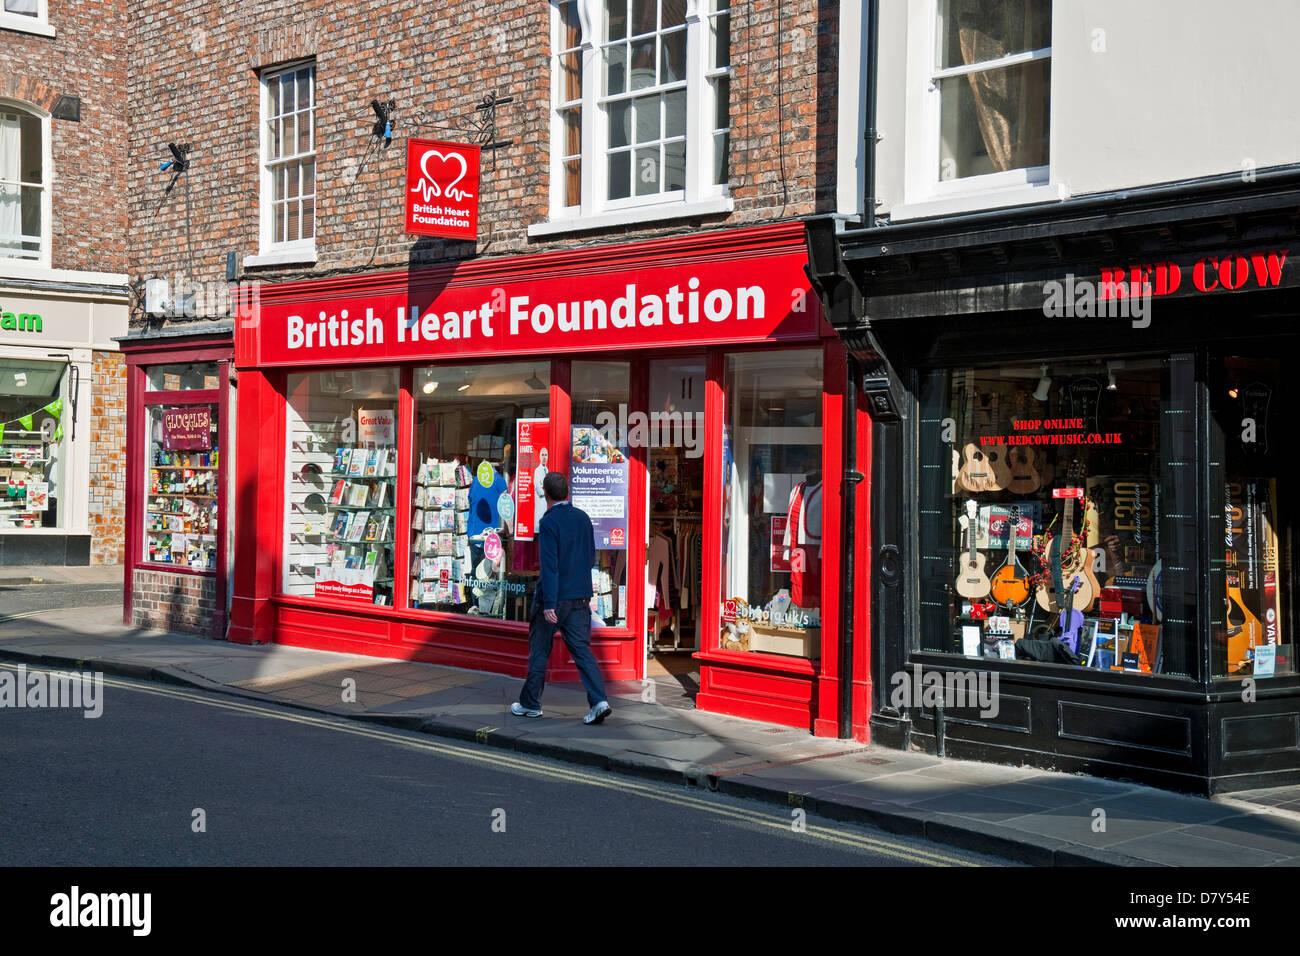 51248bcbb5e0e5 British Heart Foundation charity shop Goodramgate York North Yorkshire  England UK United Kingdom GB Great Britain